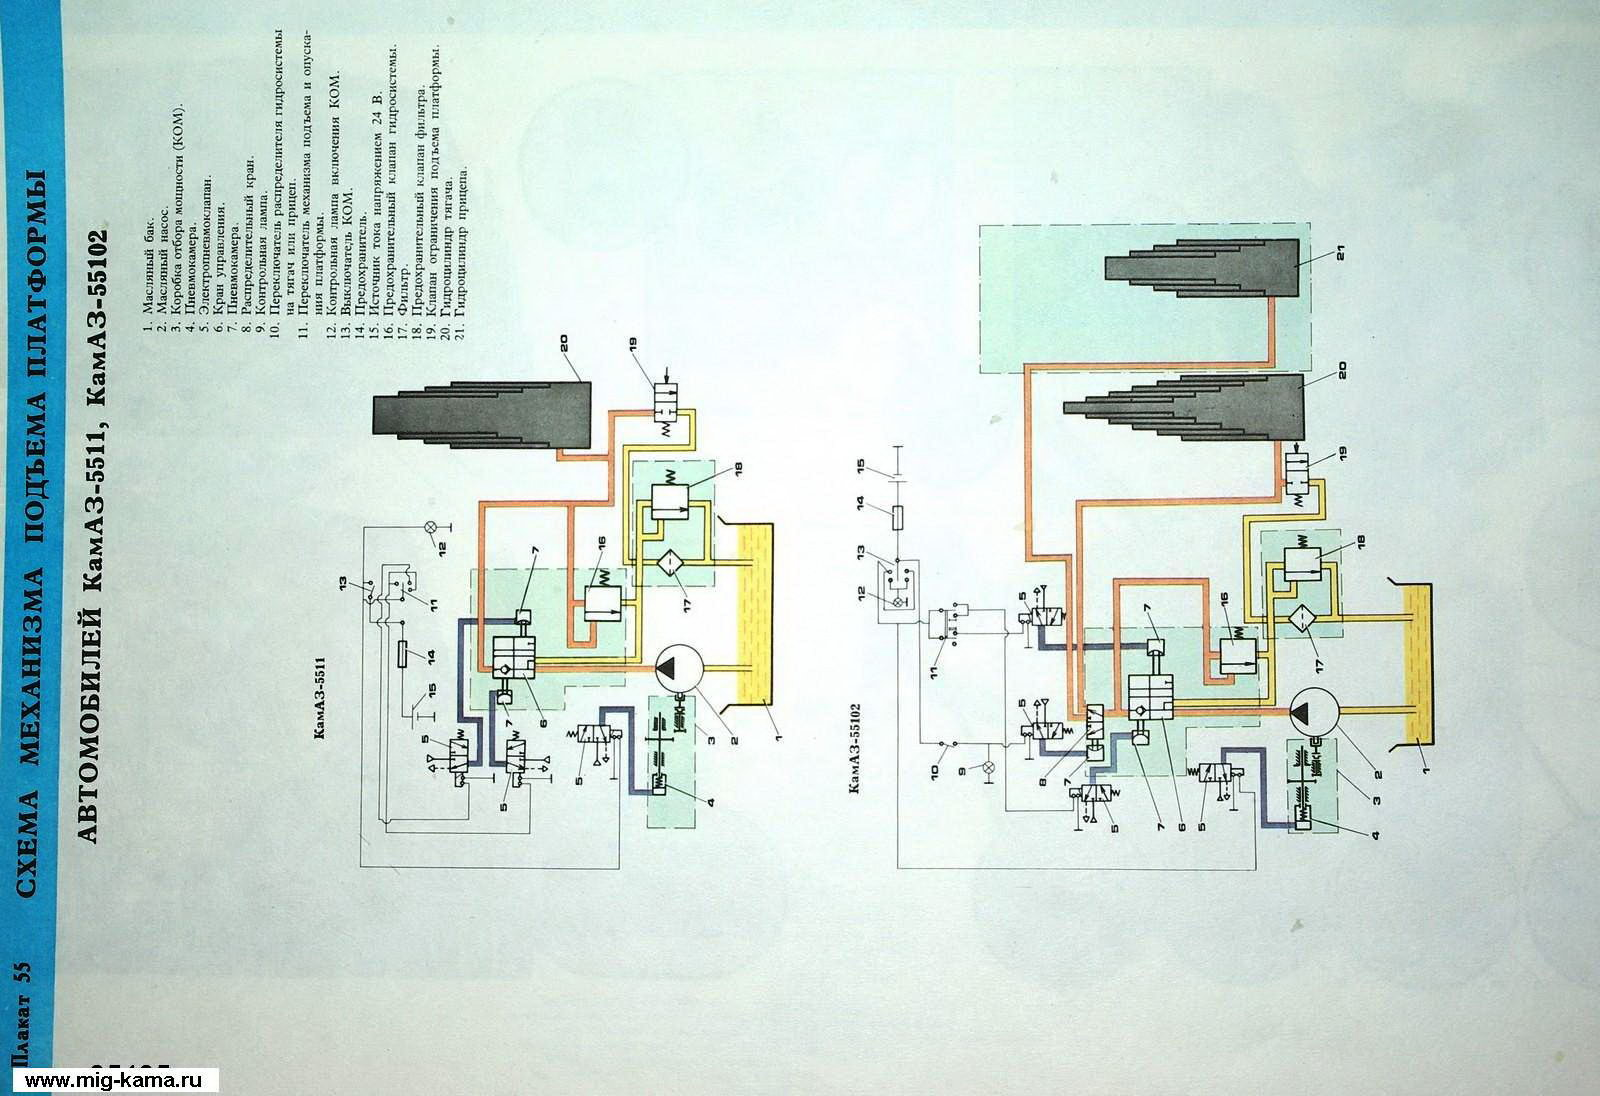 Система охлаждения камаз 5320 схема фото 563